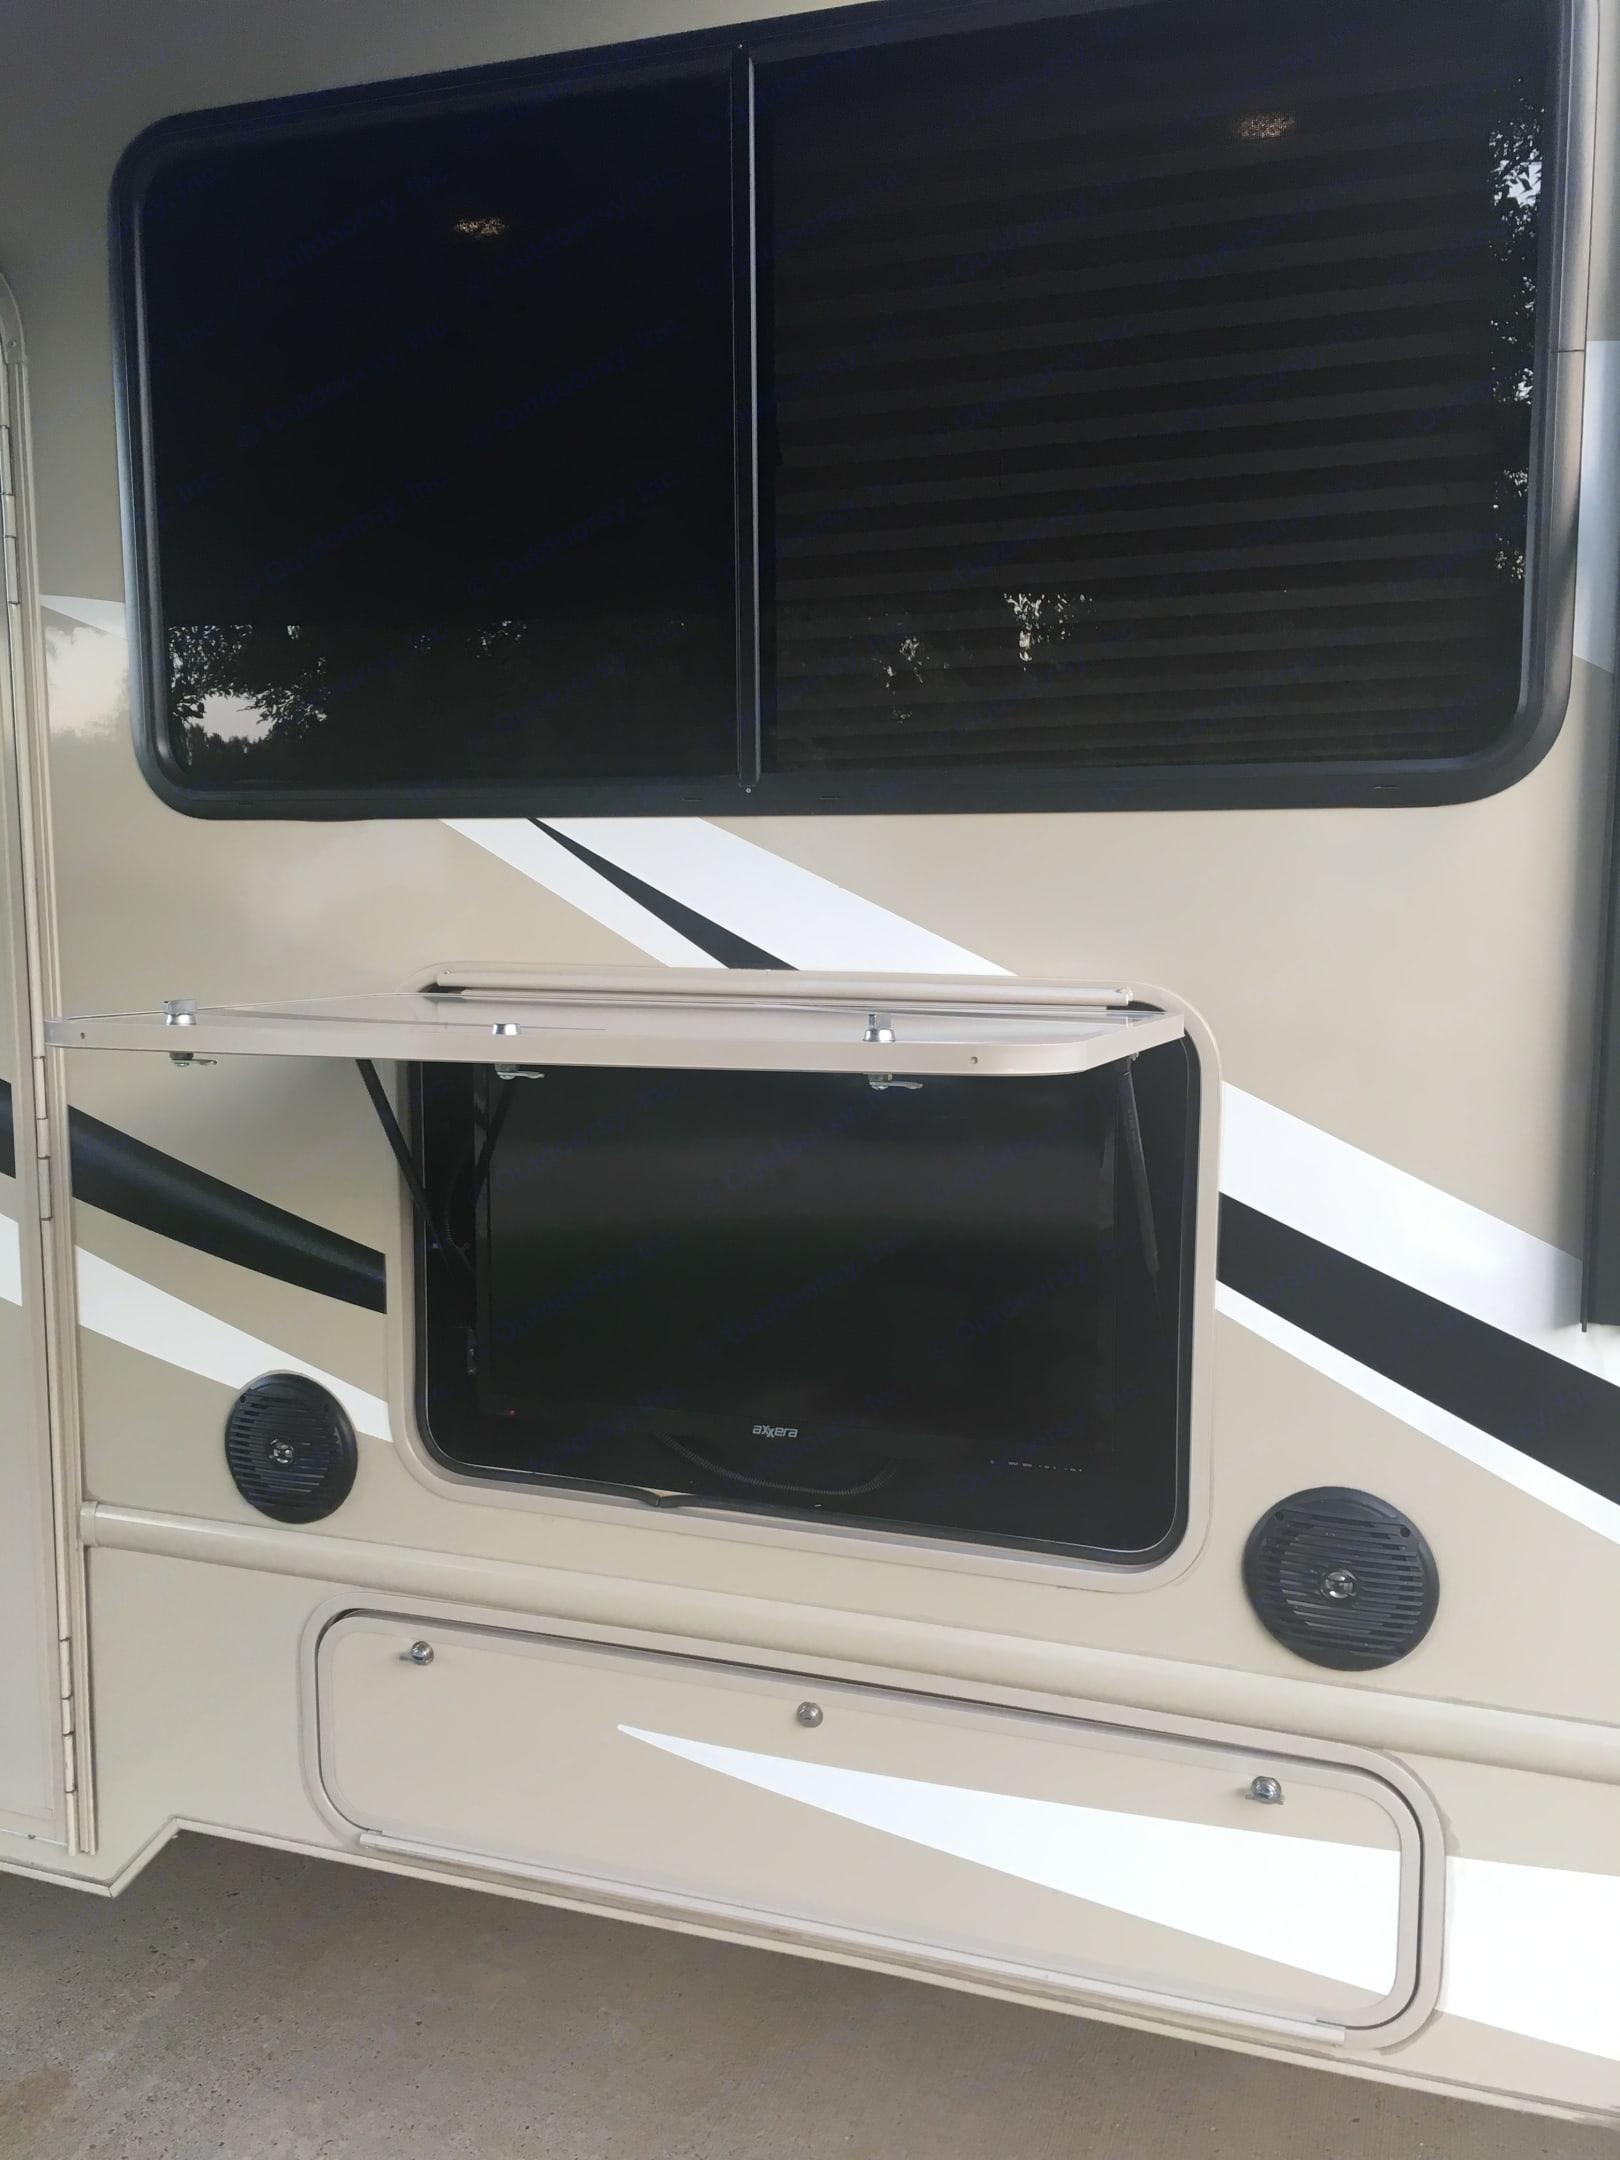 Outdoor TV/radio. Ford Fourwinds 2018